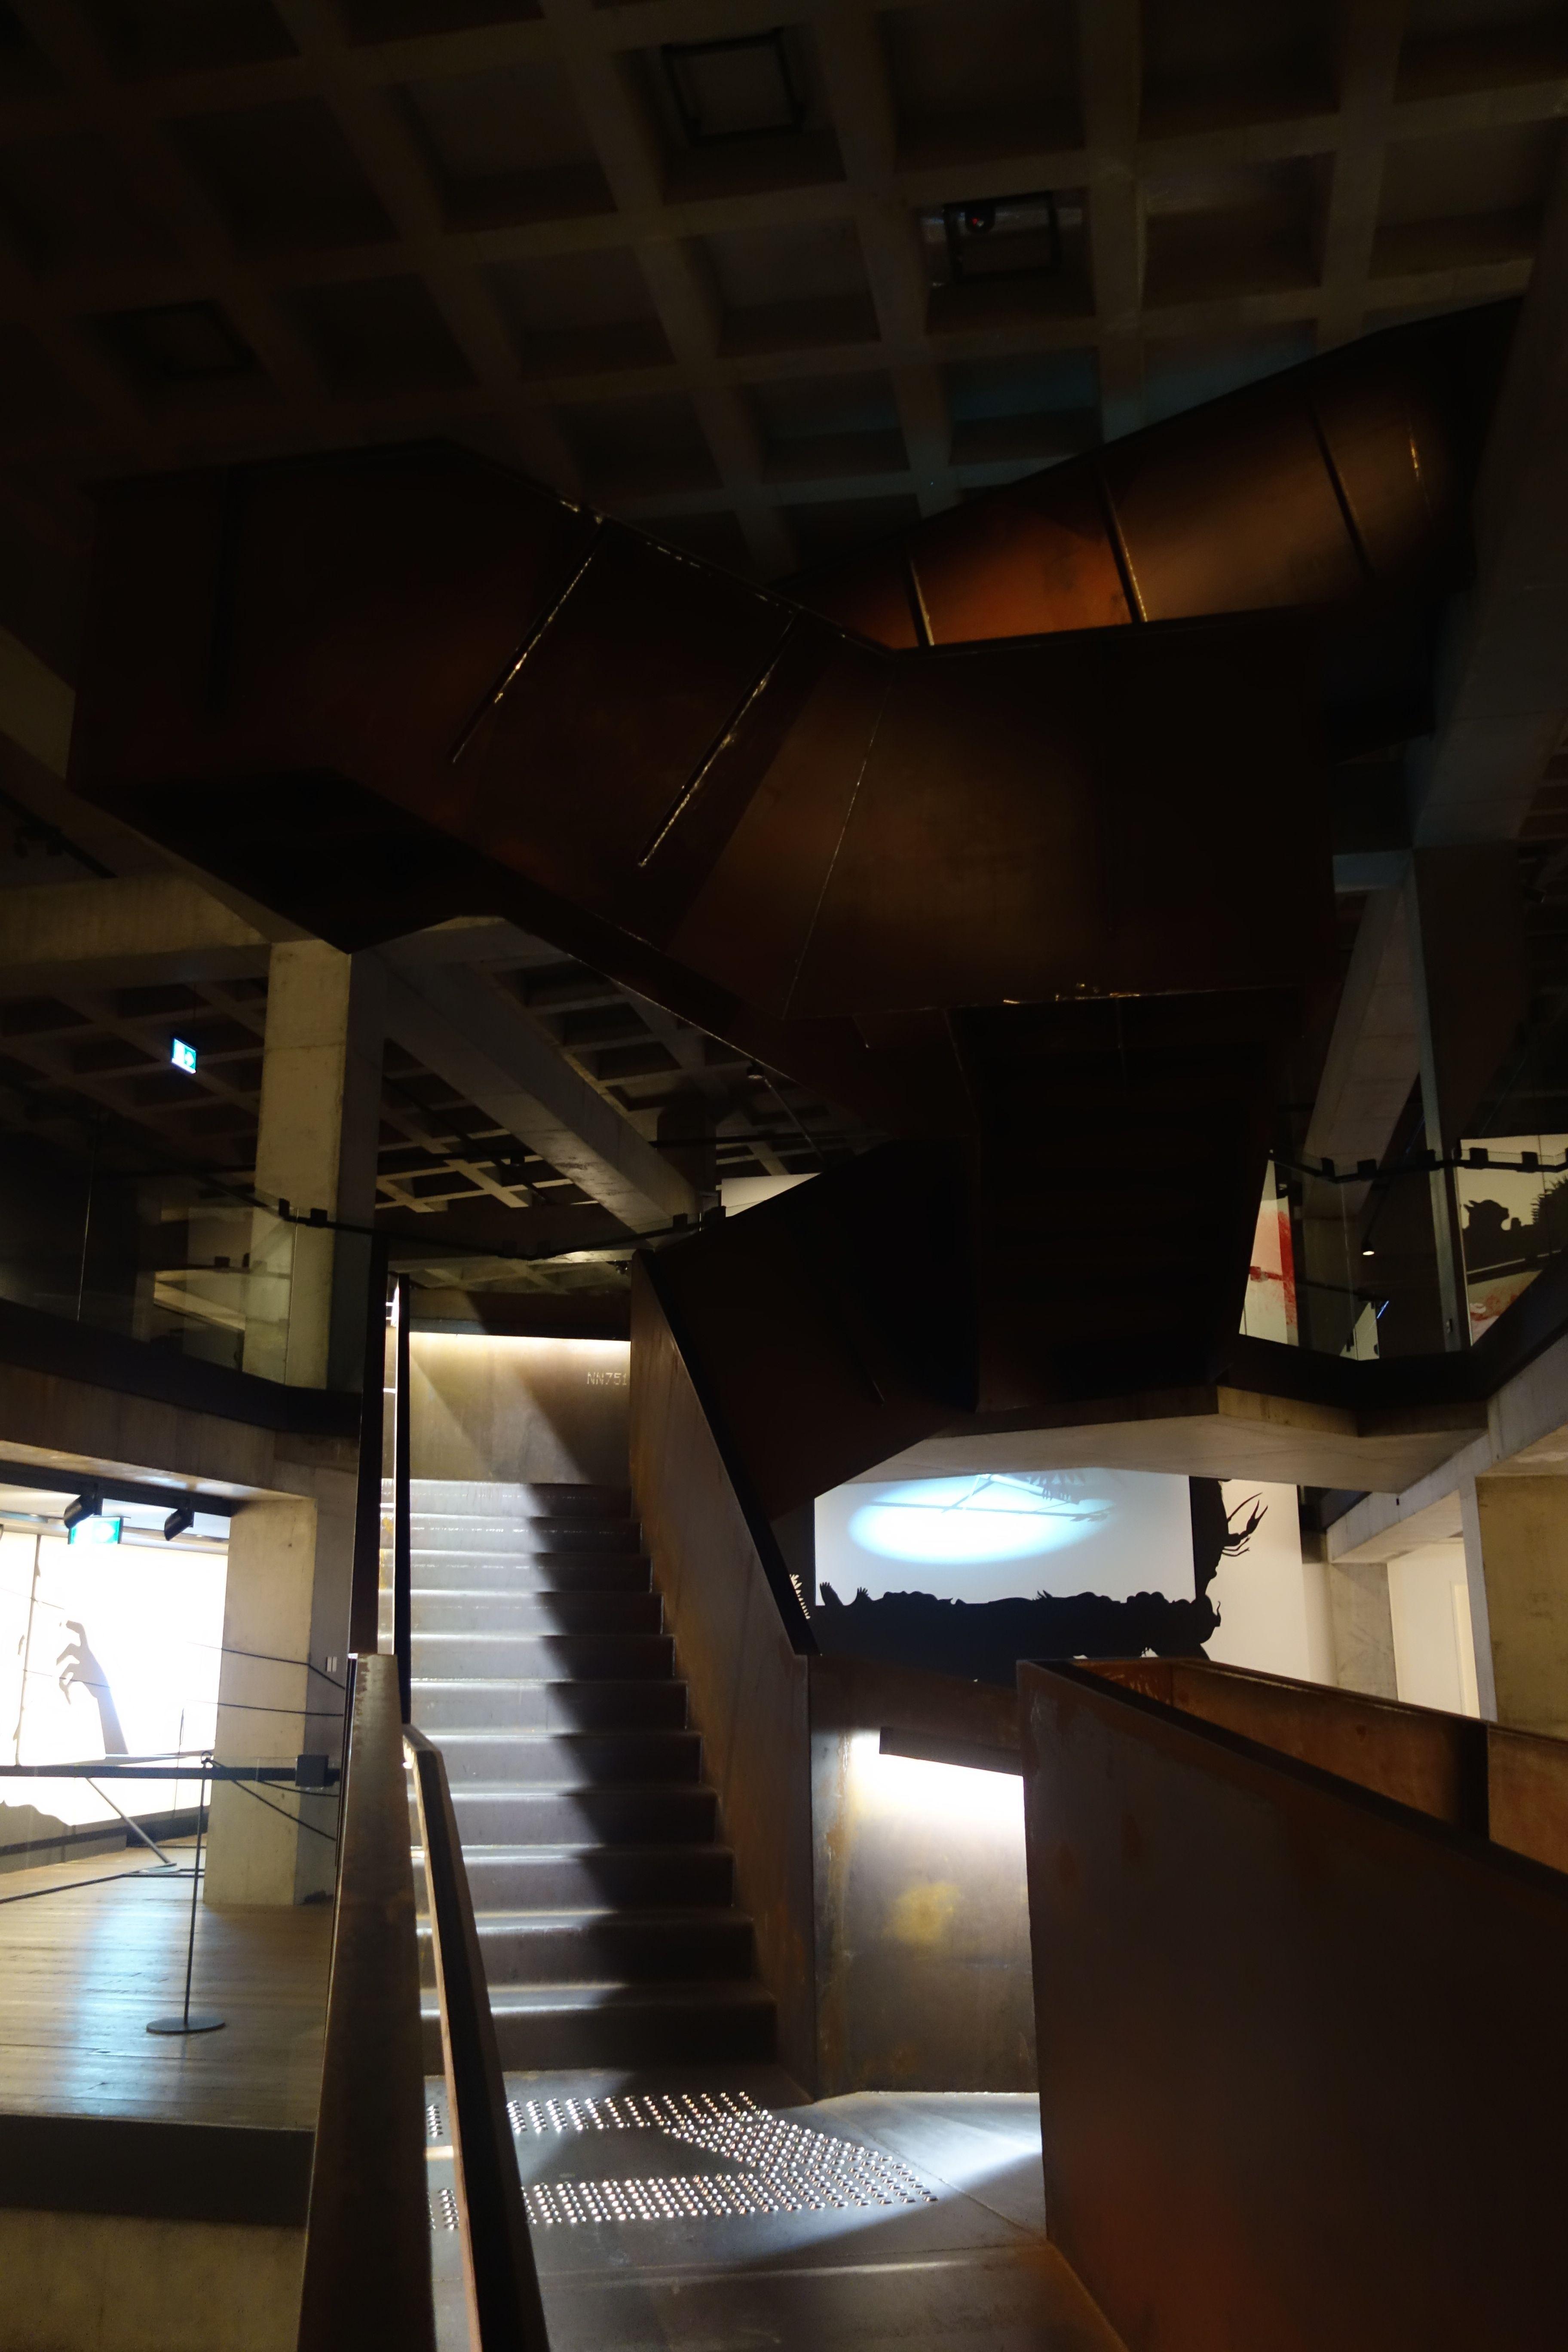 Australie- Tasmanie: L'architecture du musée.